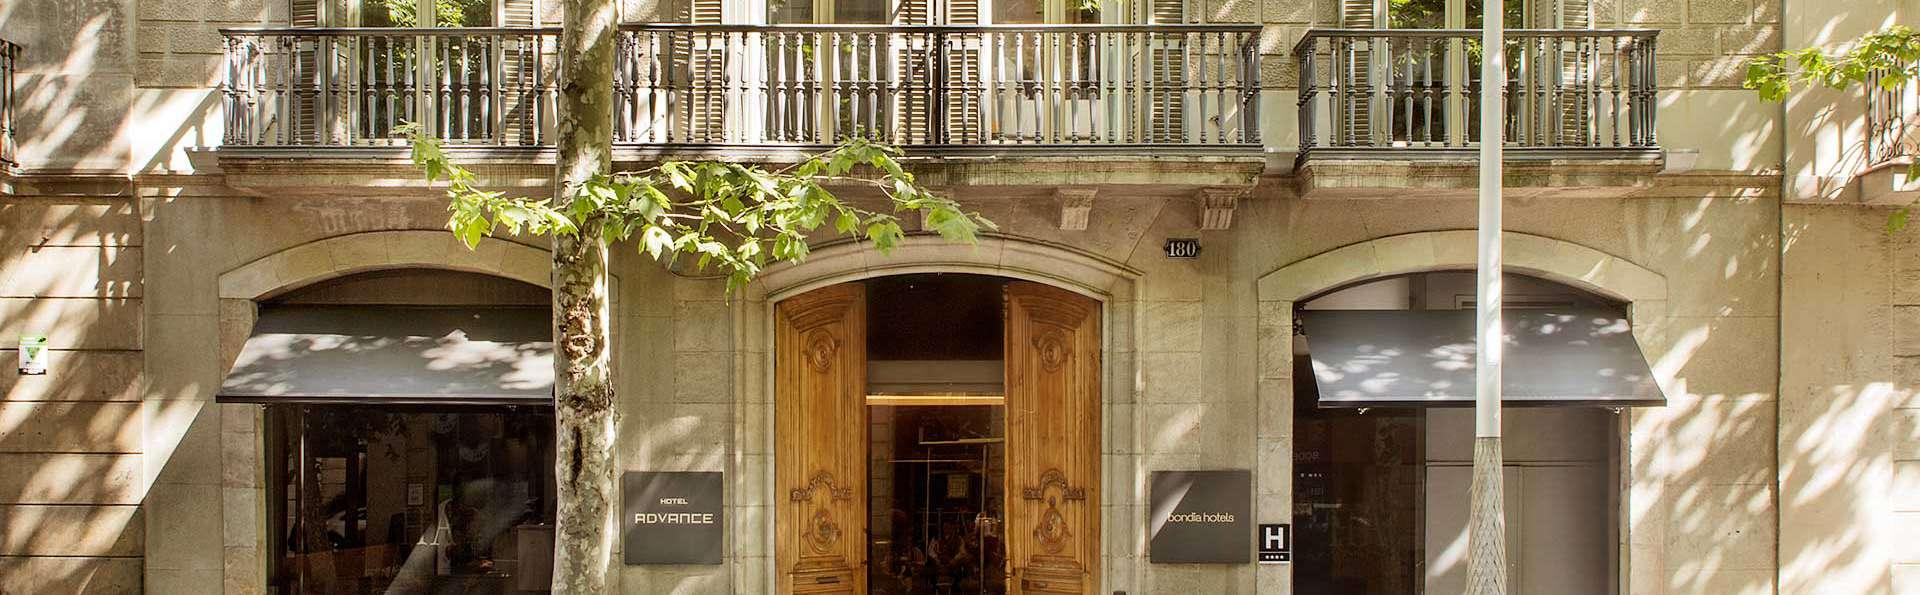 Hotel Advance Barcelona - EDIT_FRONT_01.jpg